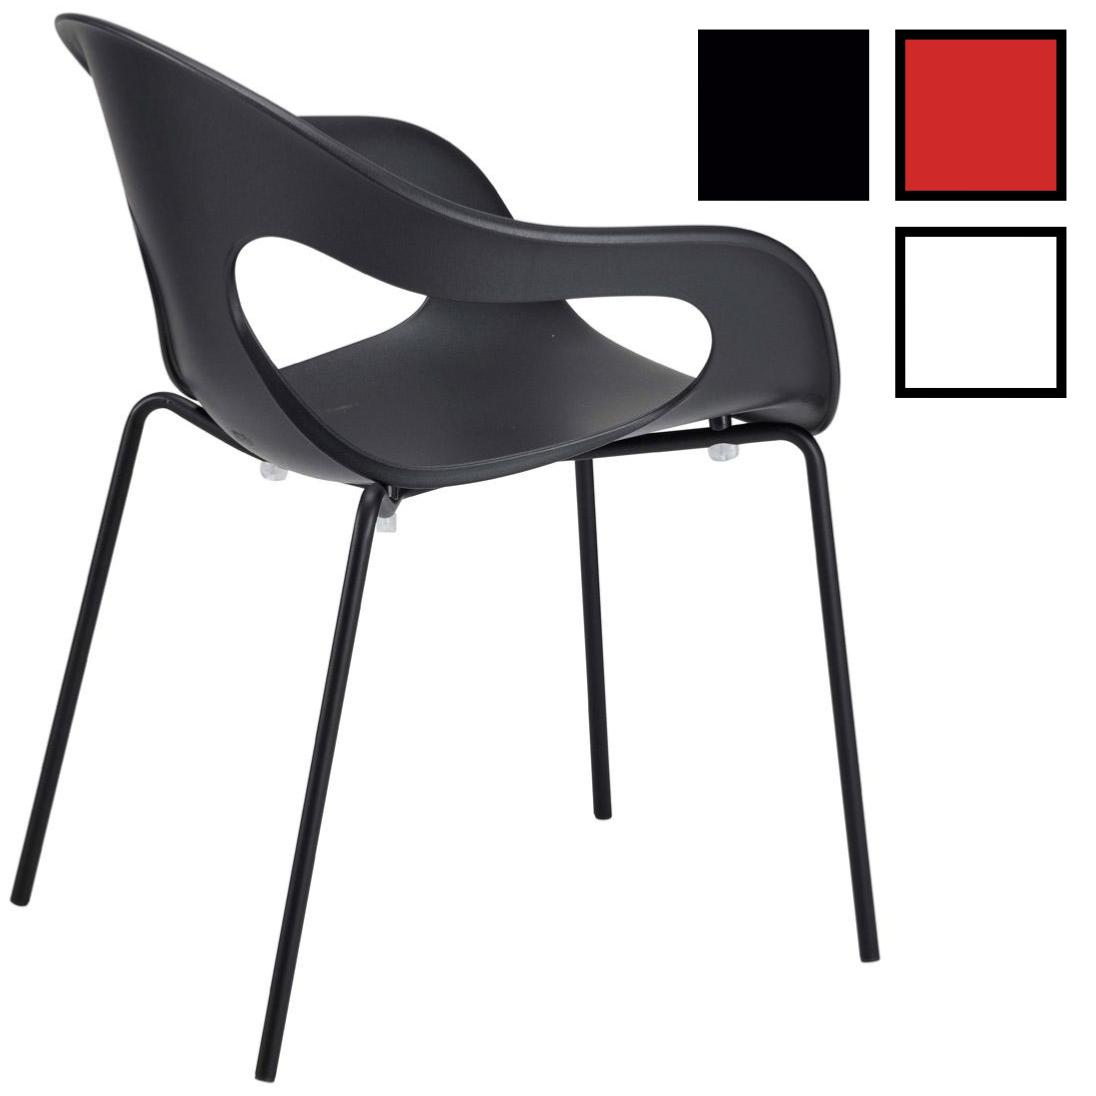 sempy chaise design empilable en polypropylene noire